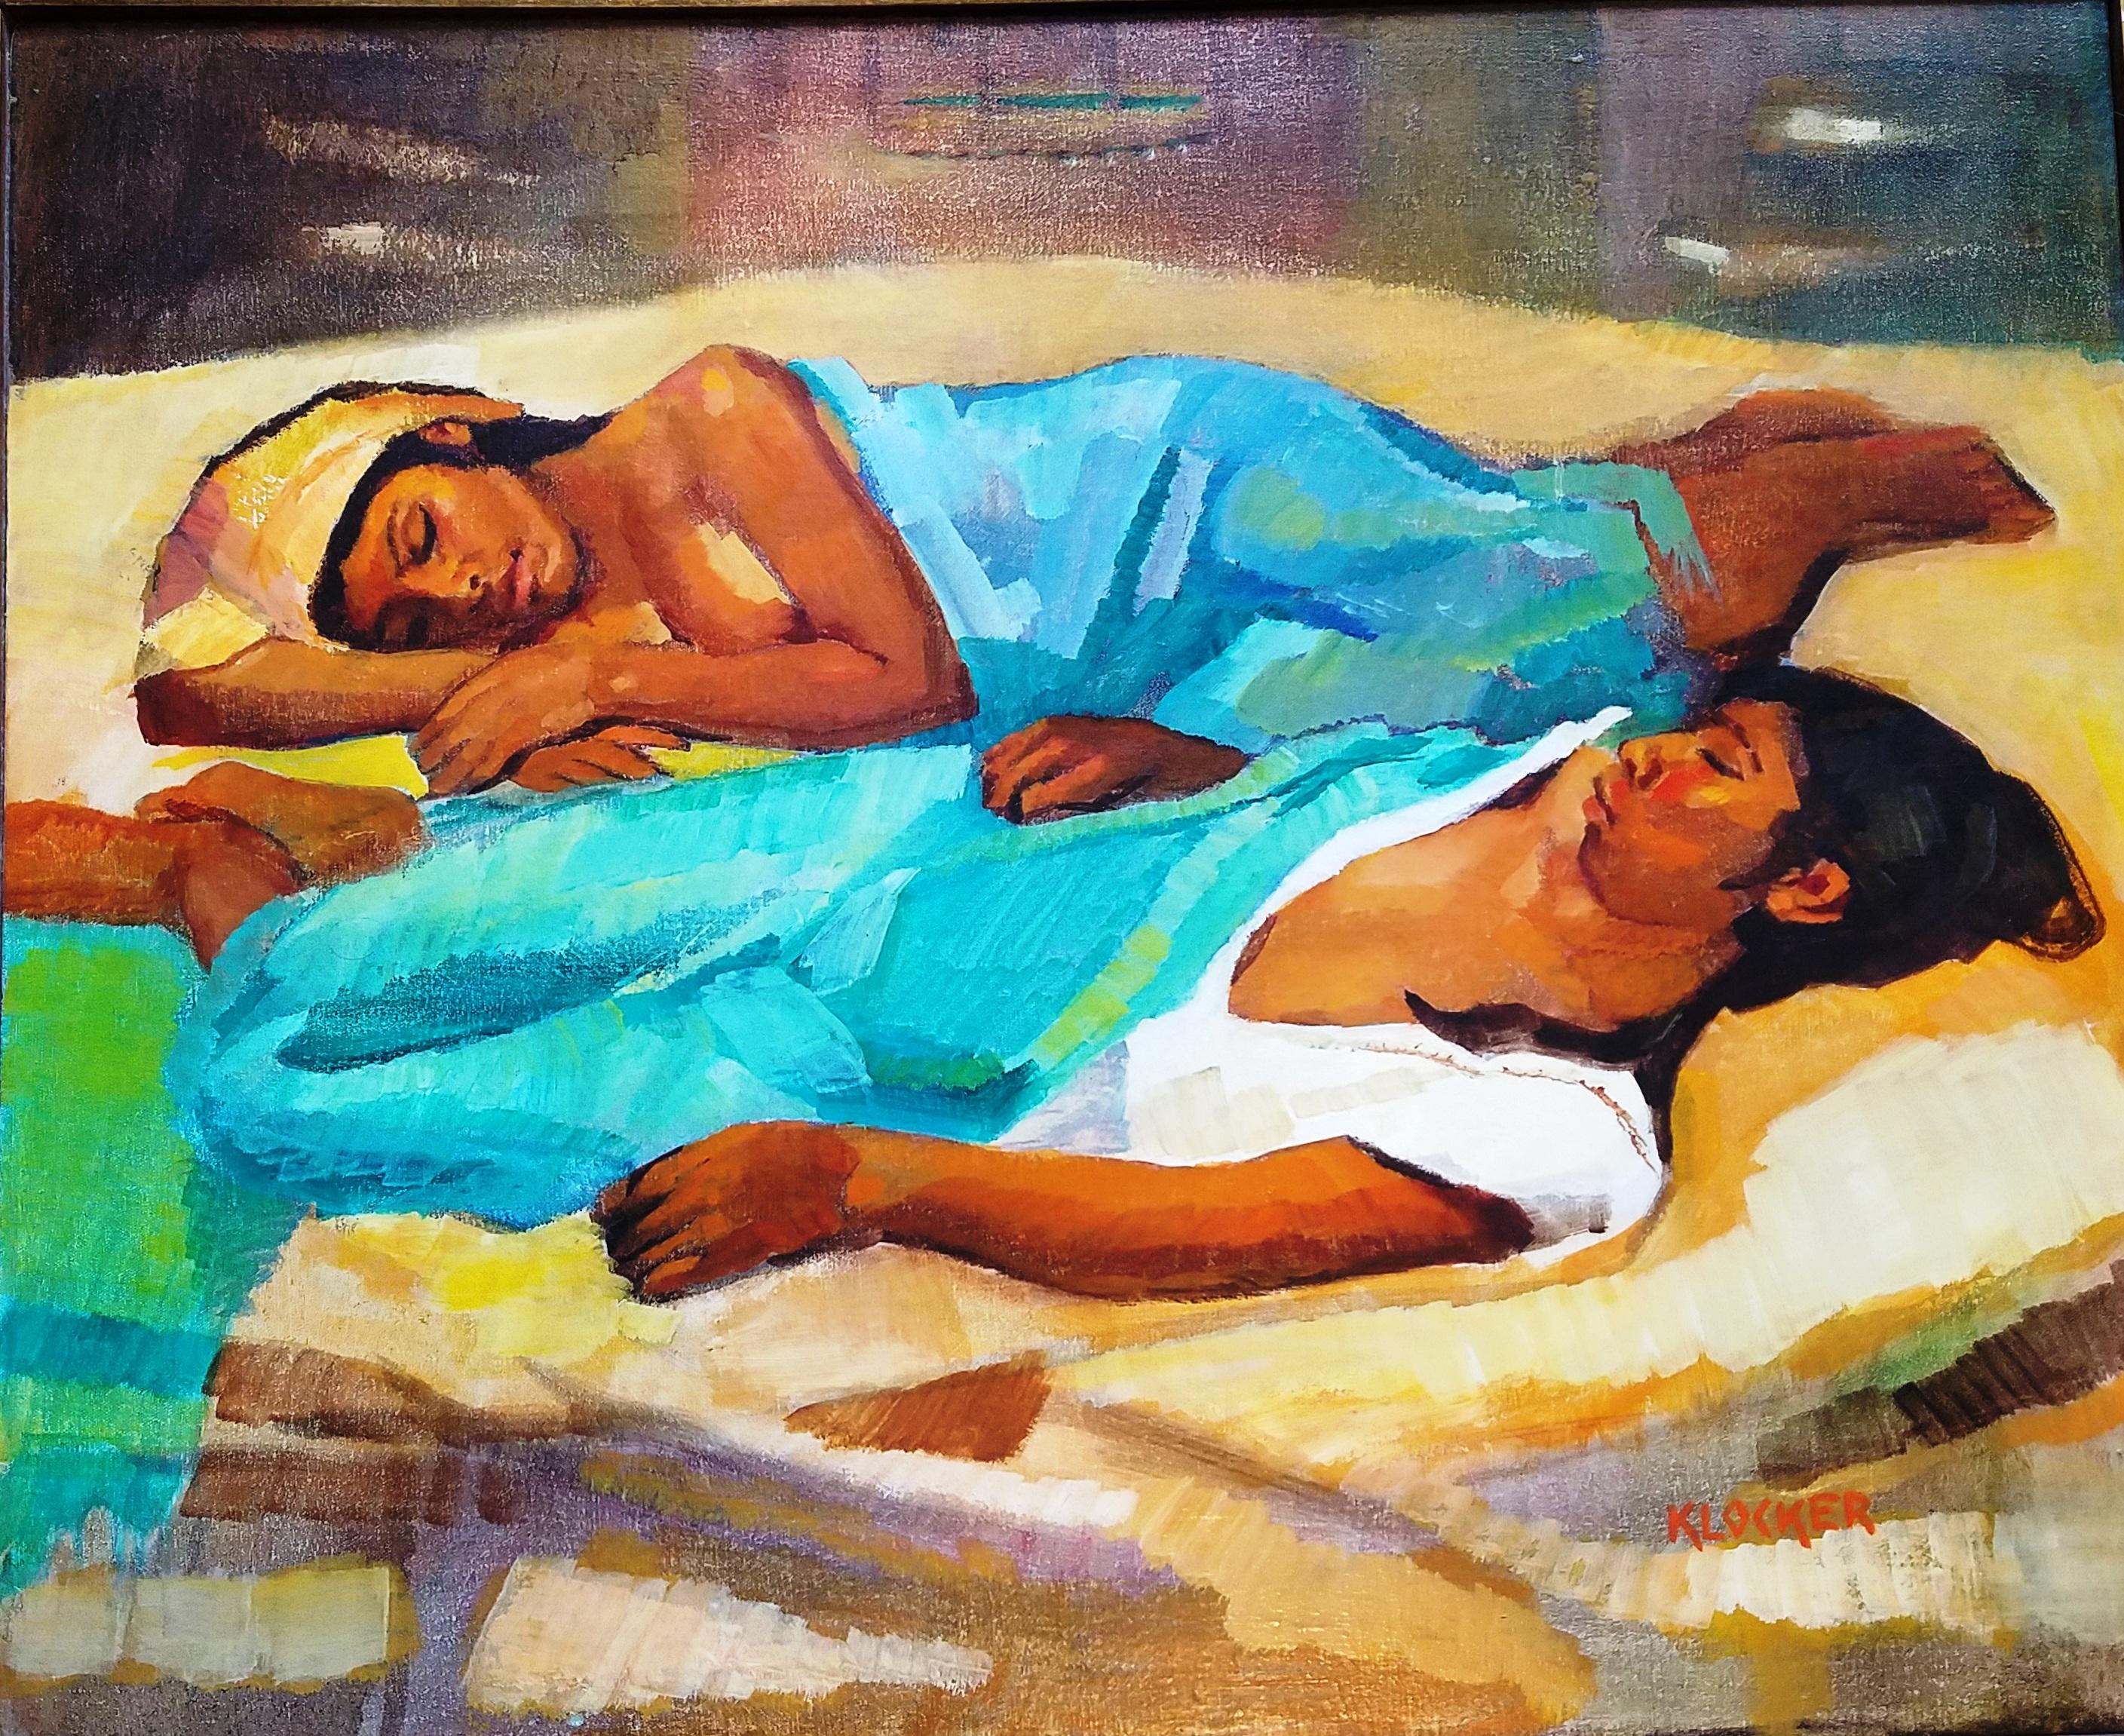 Las Dormidas artwork by Gil Klocker - art listed for sale on Artplode